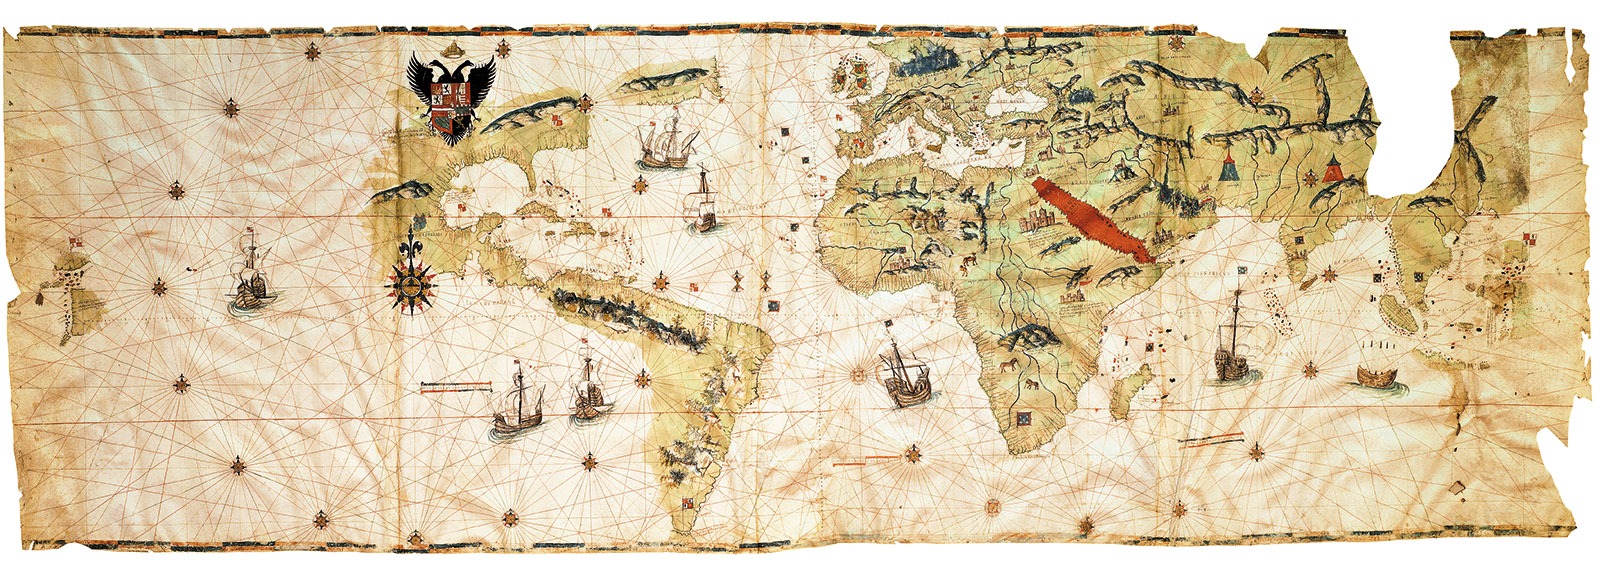 World Map by Juan Vespucci, Seville, 1526